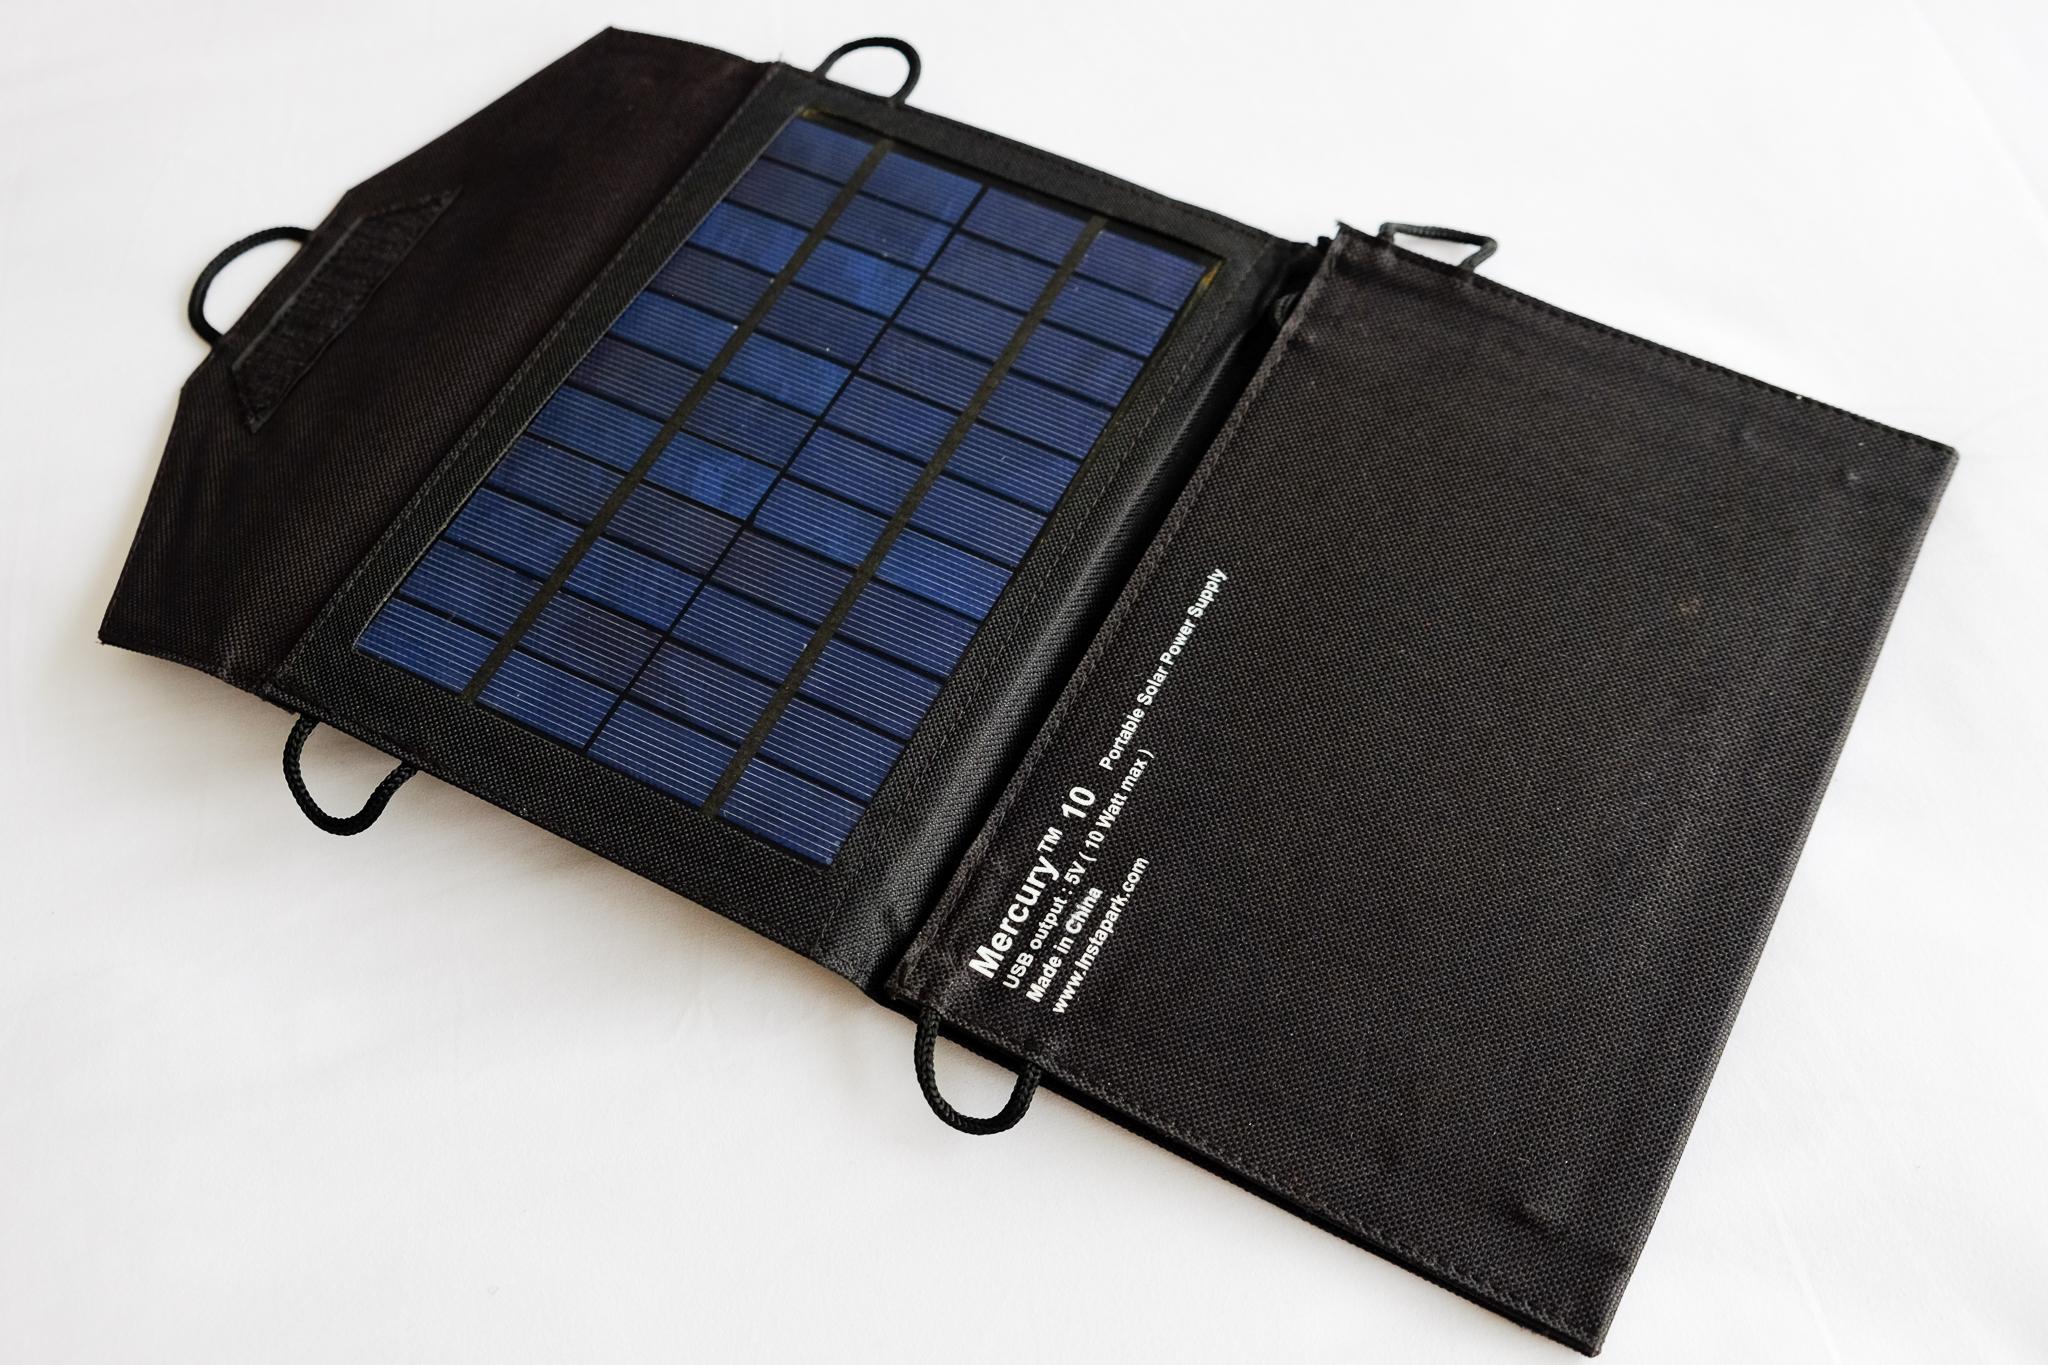 InstaPark Mercury 10W Portable Solar Charger